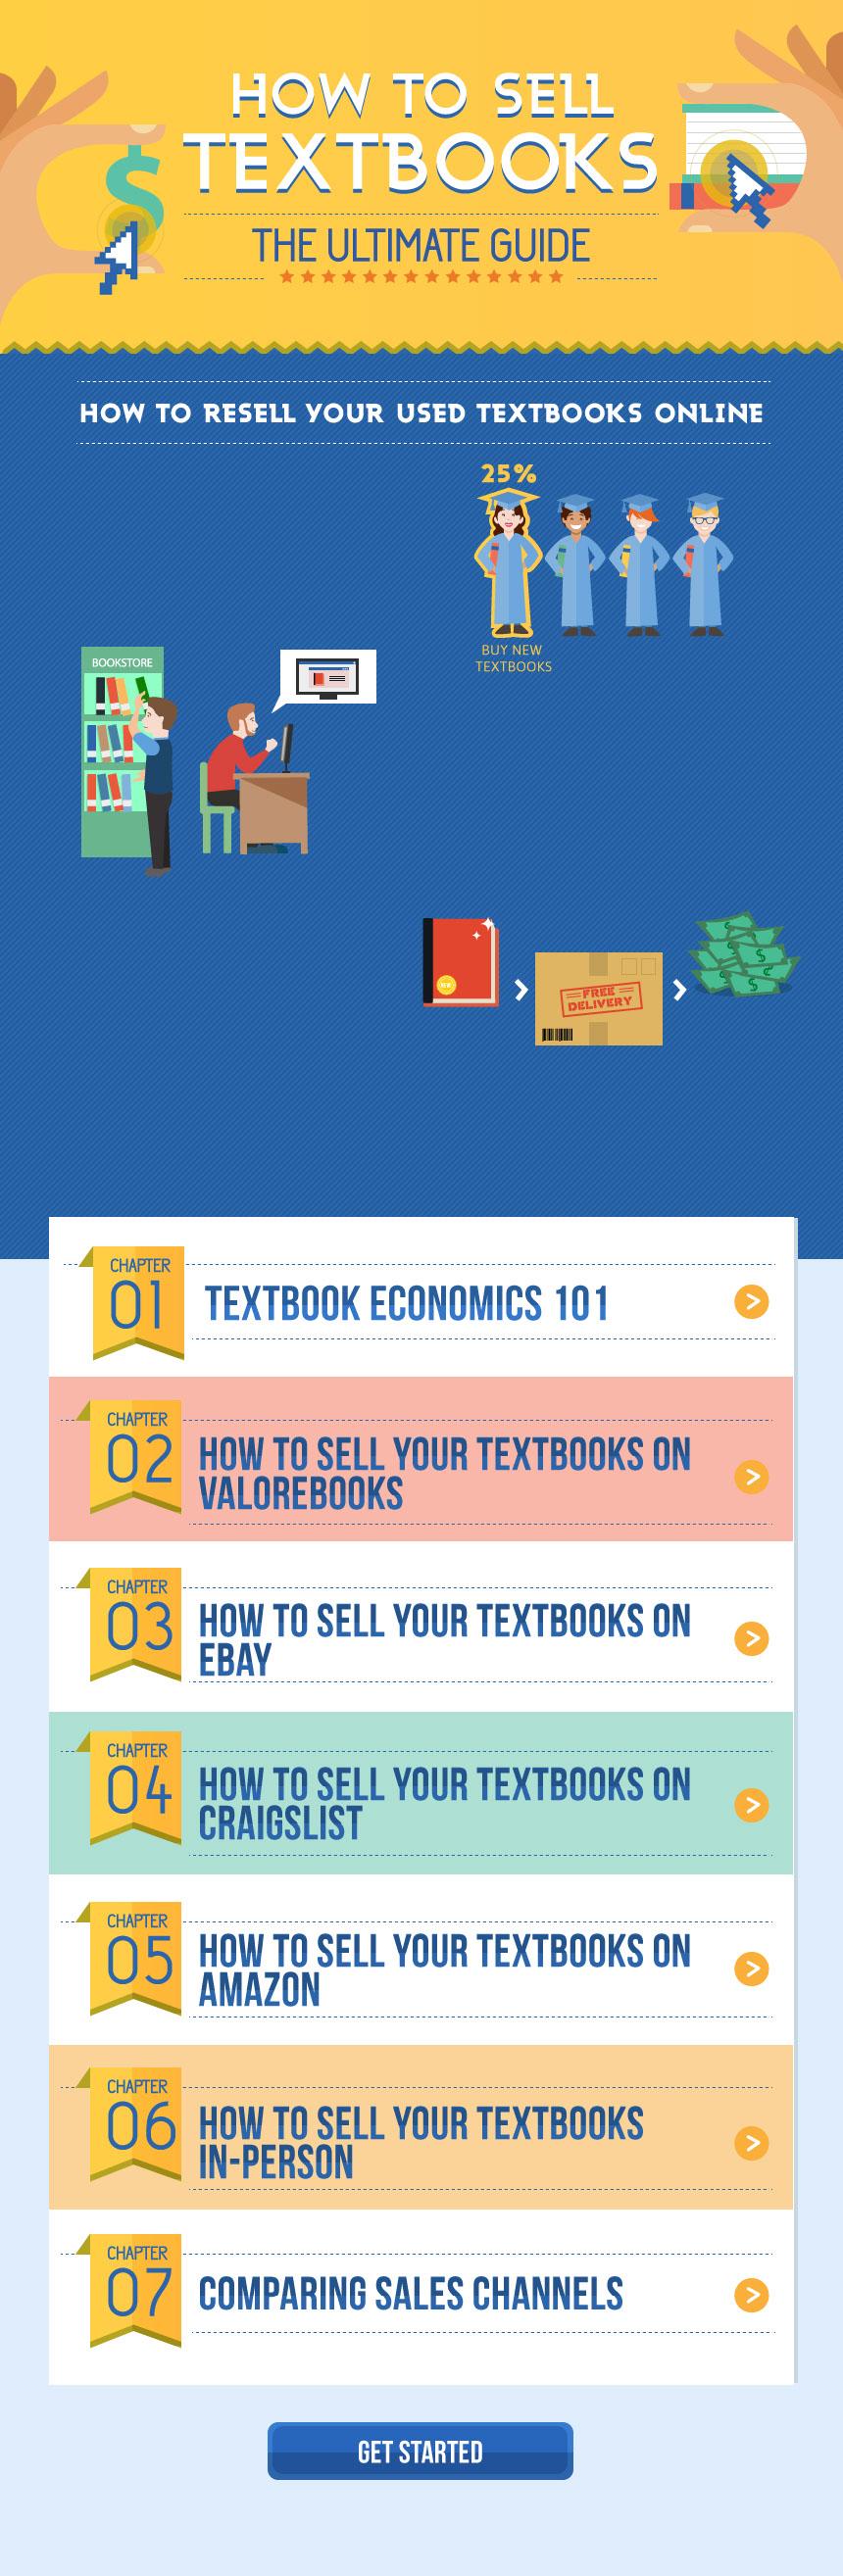 valore book buyback reviews